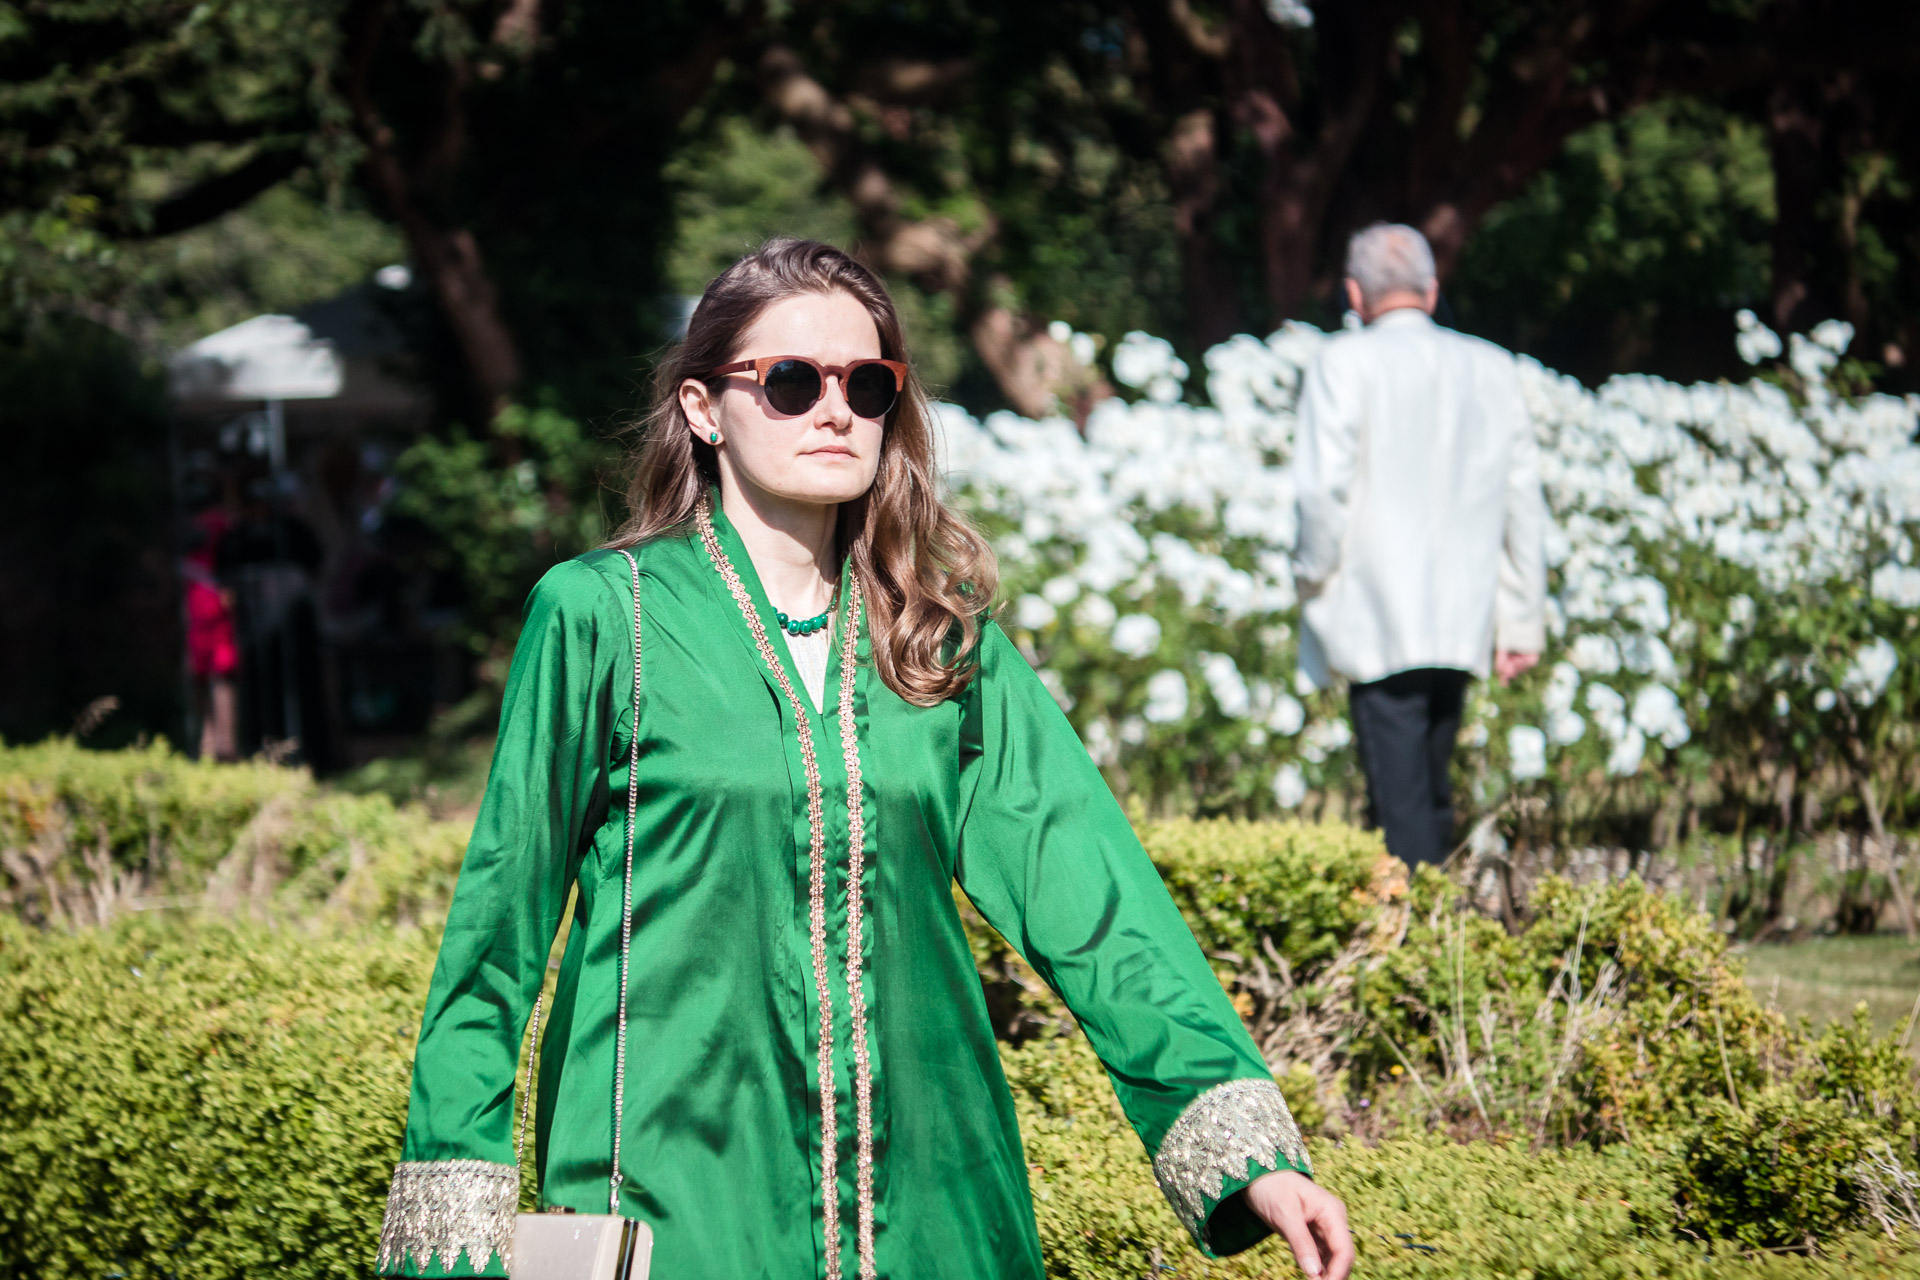 Grange Park Opera Summer 2018